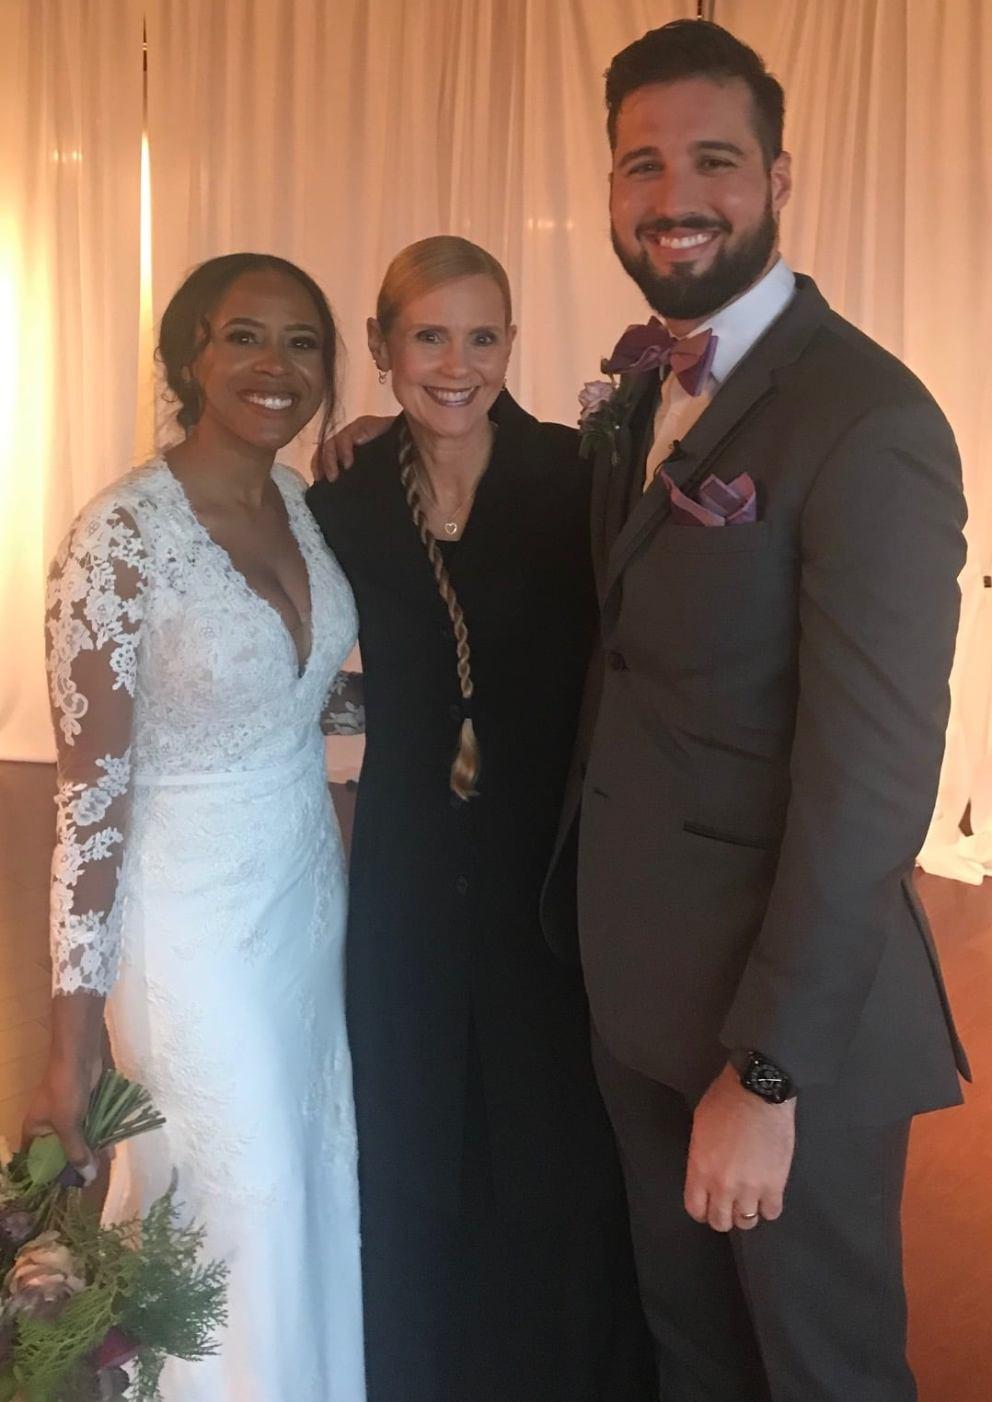 Cindy Riggs Custom Wedding Ceremonies